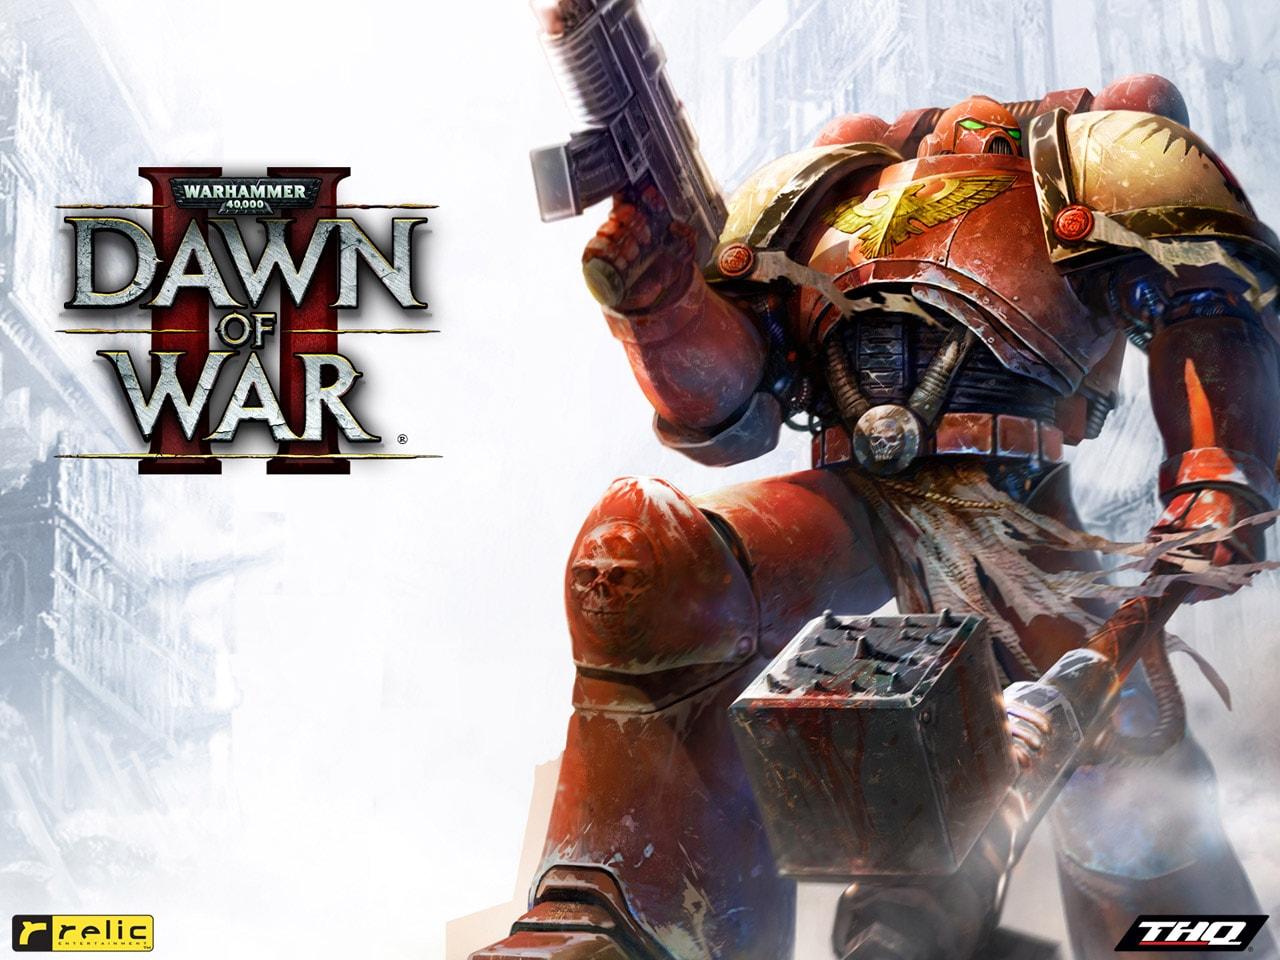 Cheat Happens - Warhammer 40k: Dawn of War 2 Wallpaper